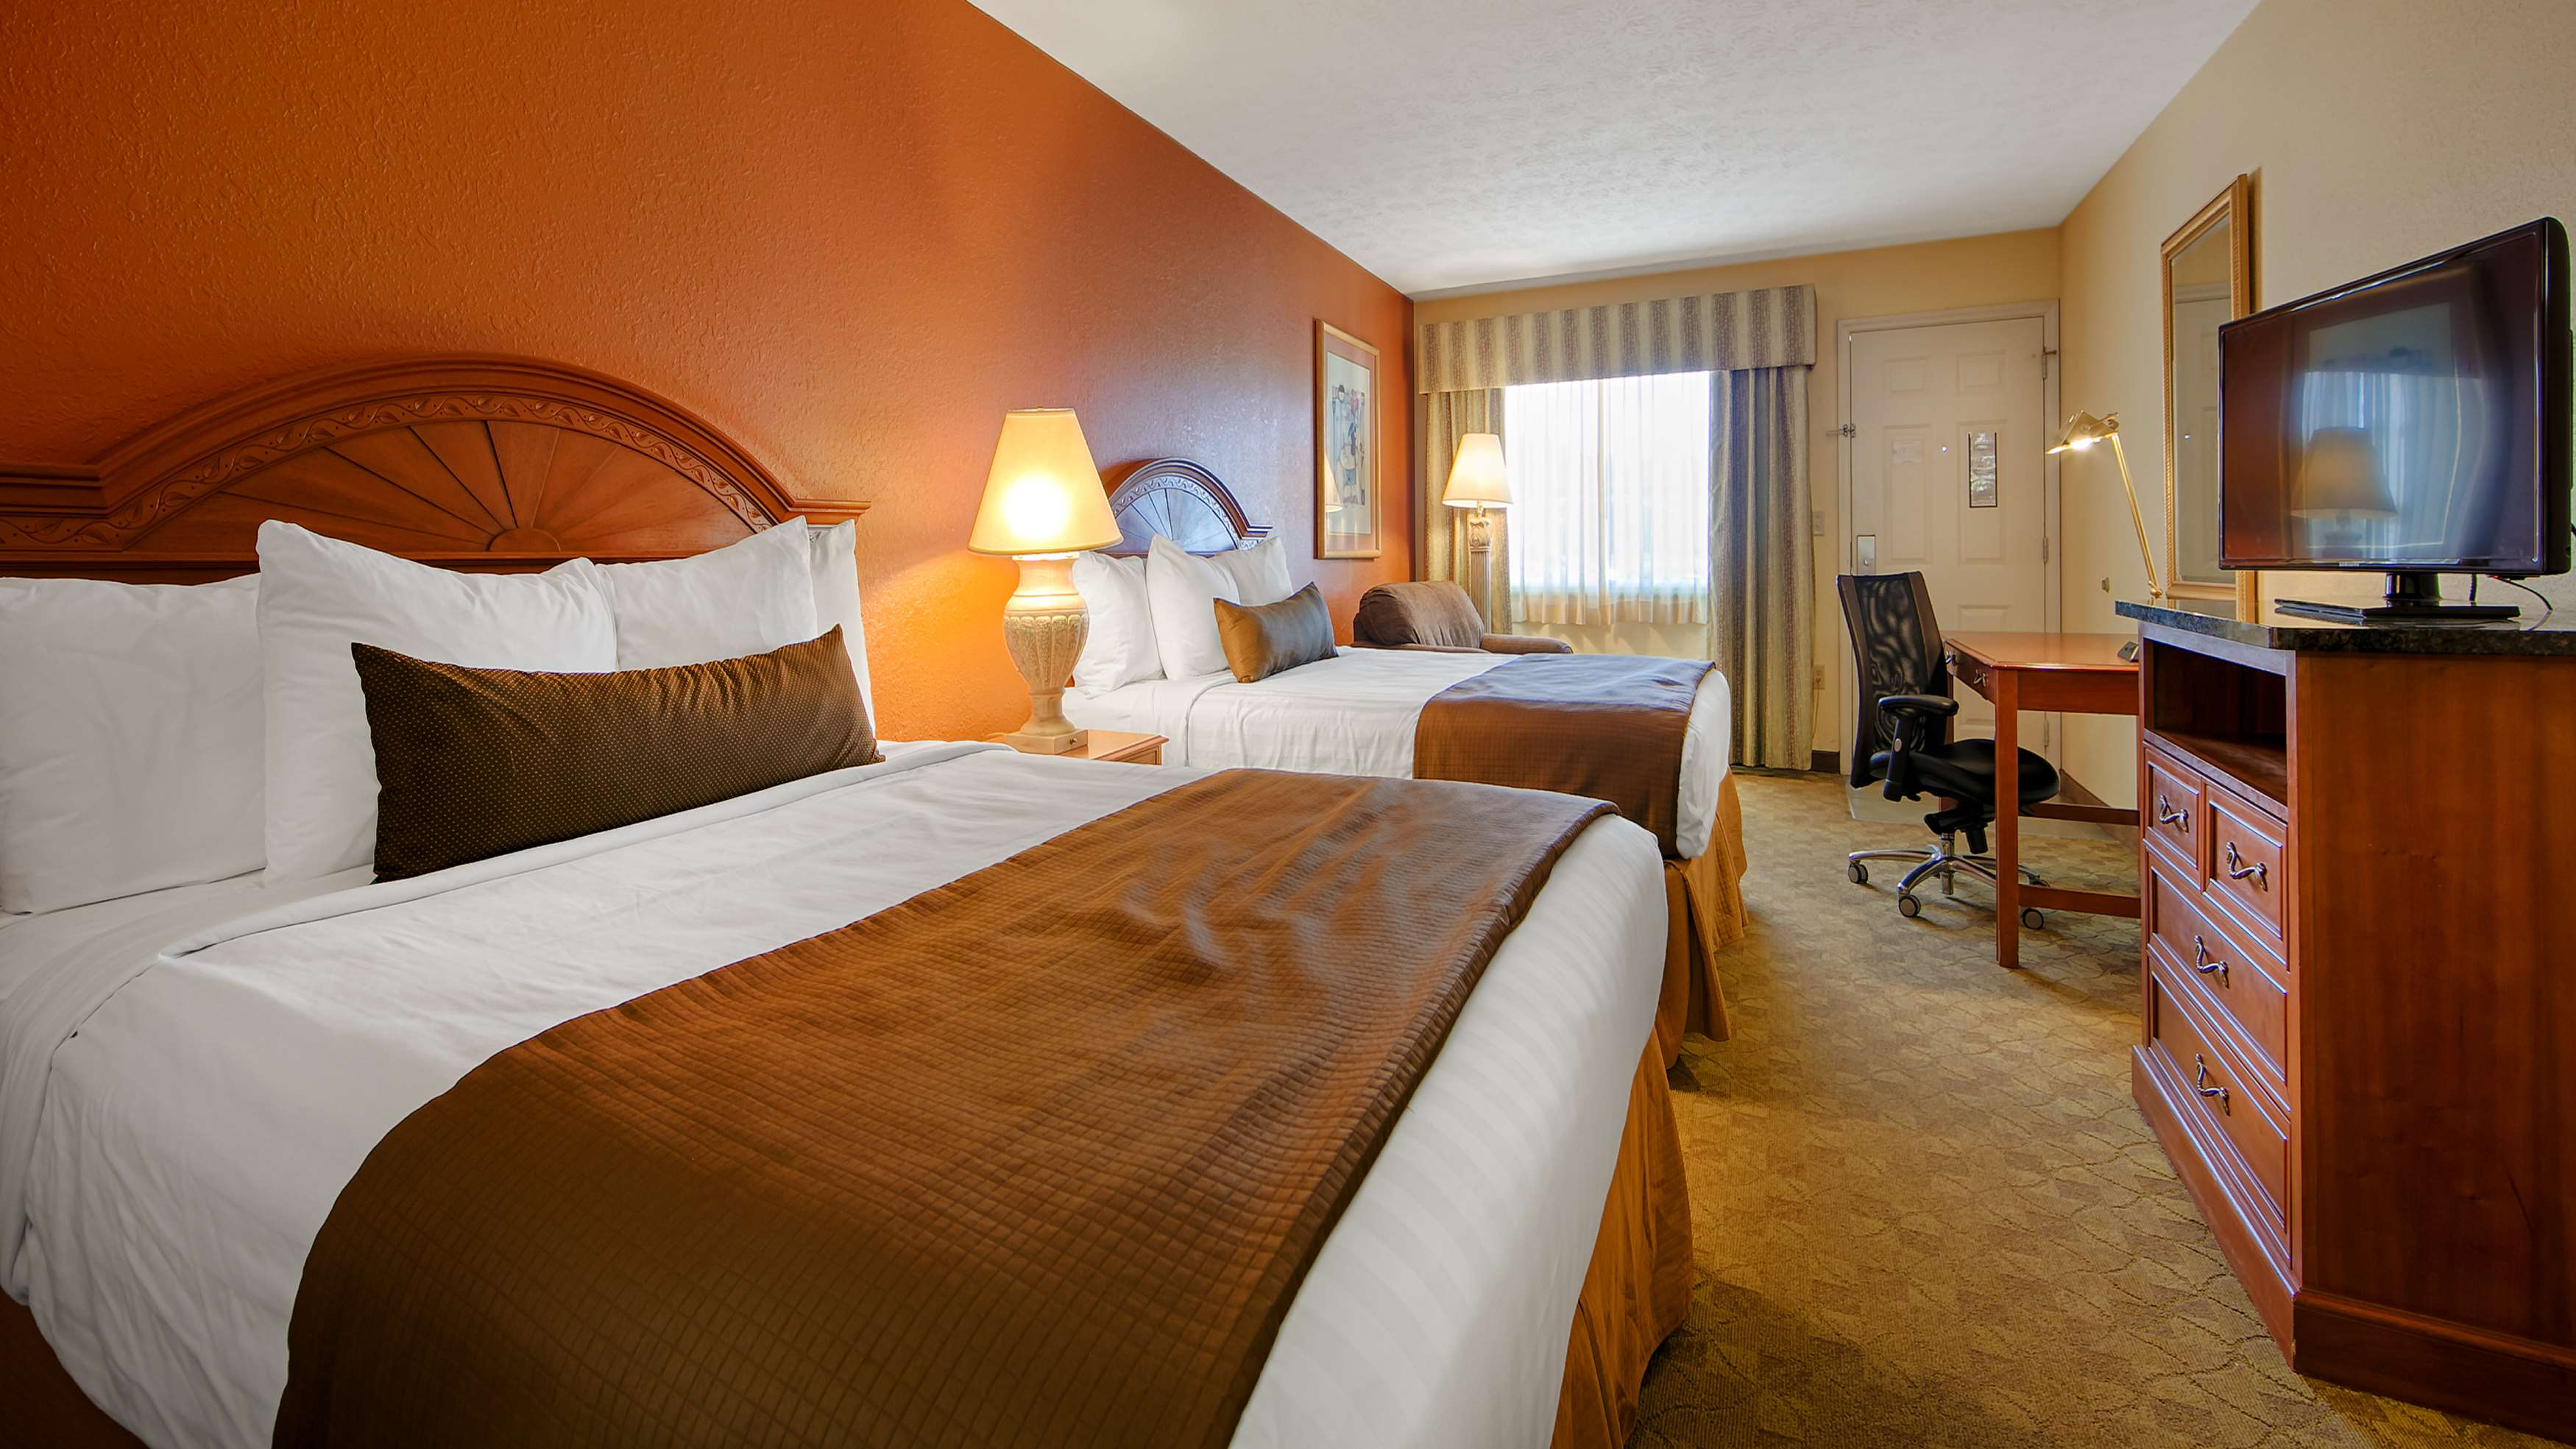 Deals On Hotel Room In Dayton Tn